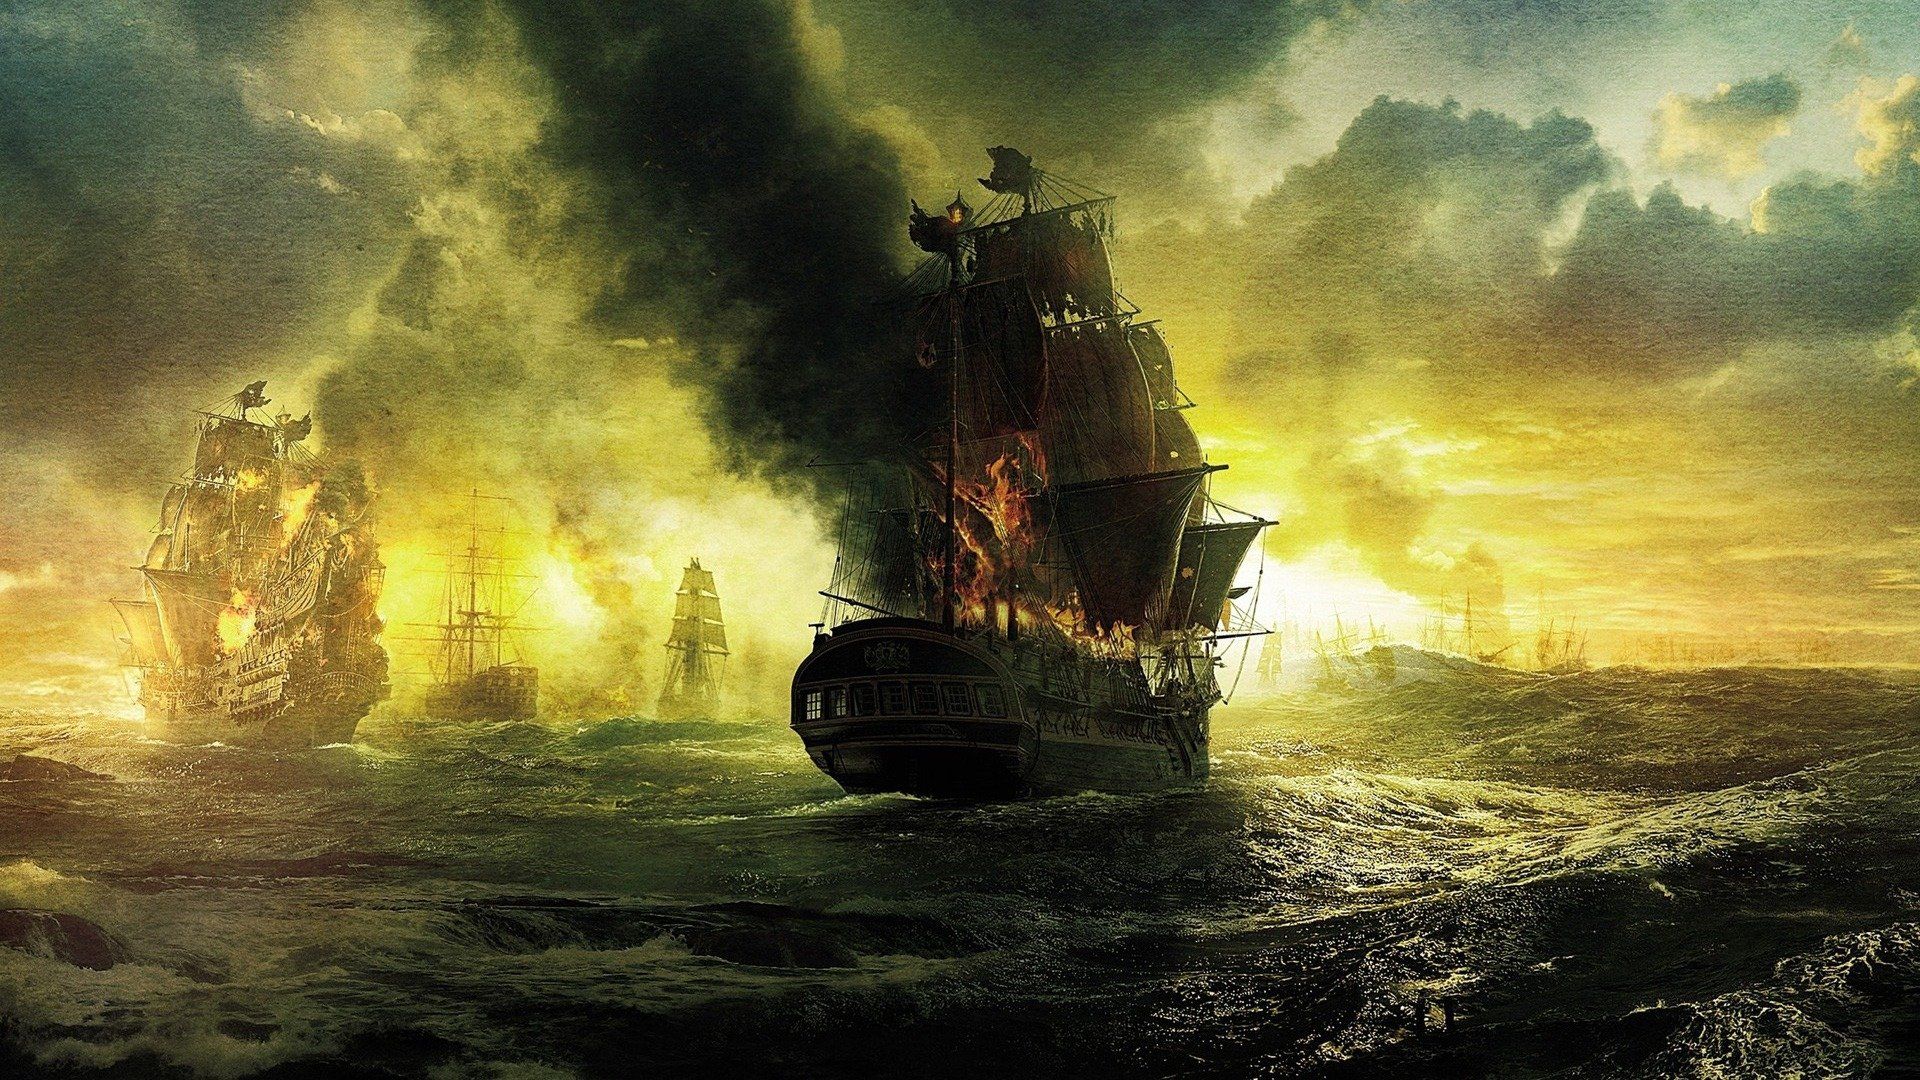 yanan gemi resmi